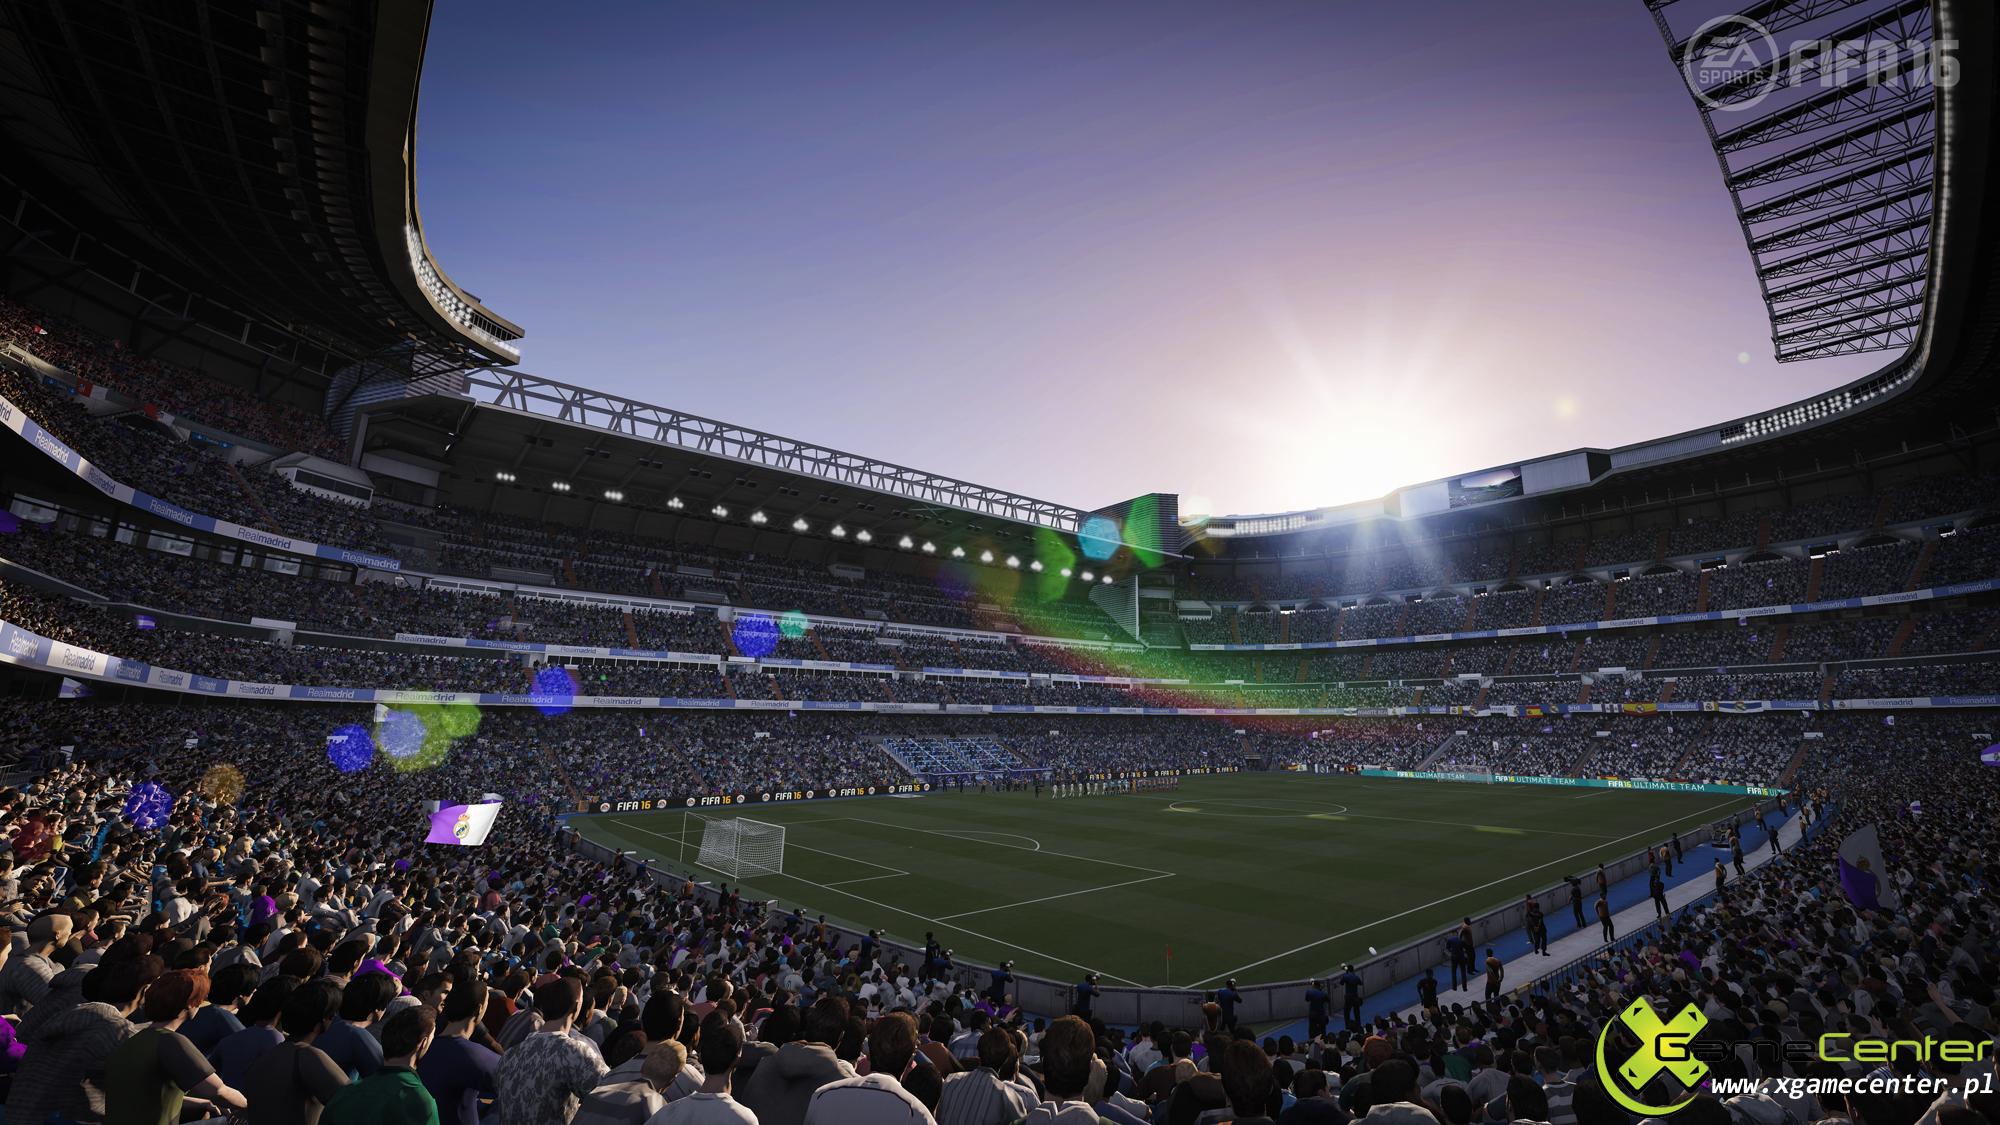 FIFA16 XboxOne PS4 FirstParty Bernabeu screen xgamecenter